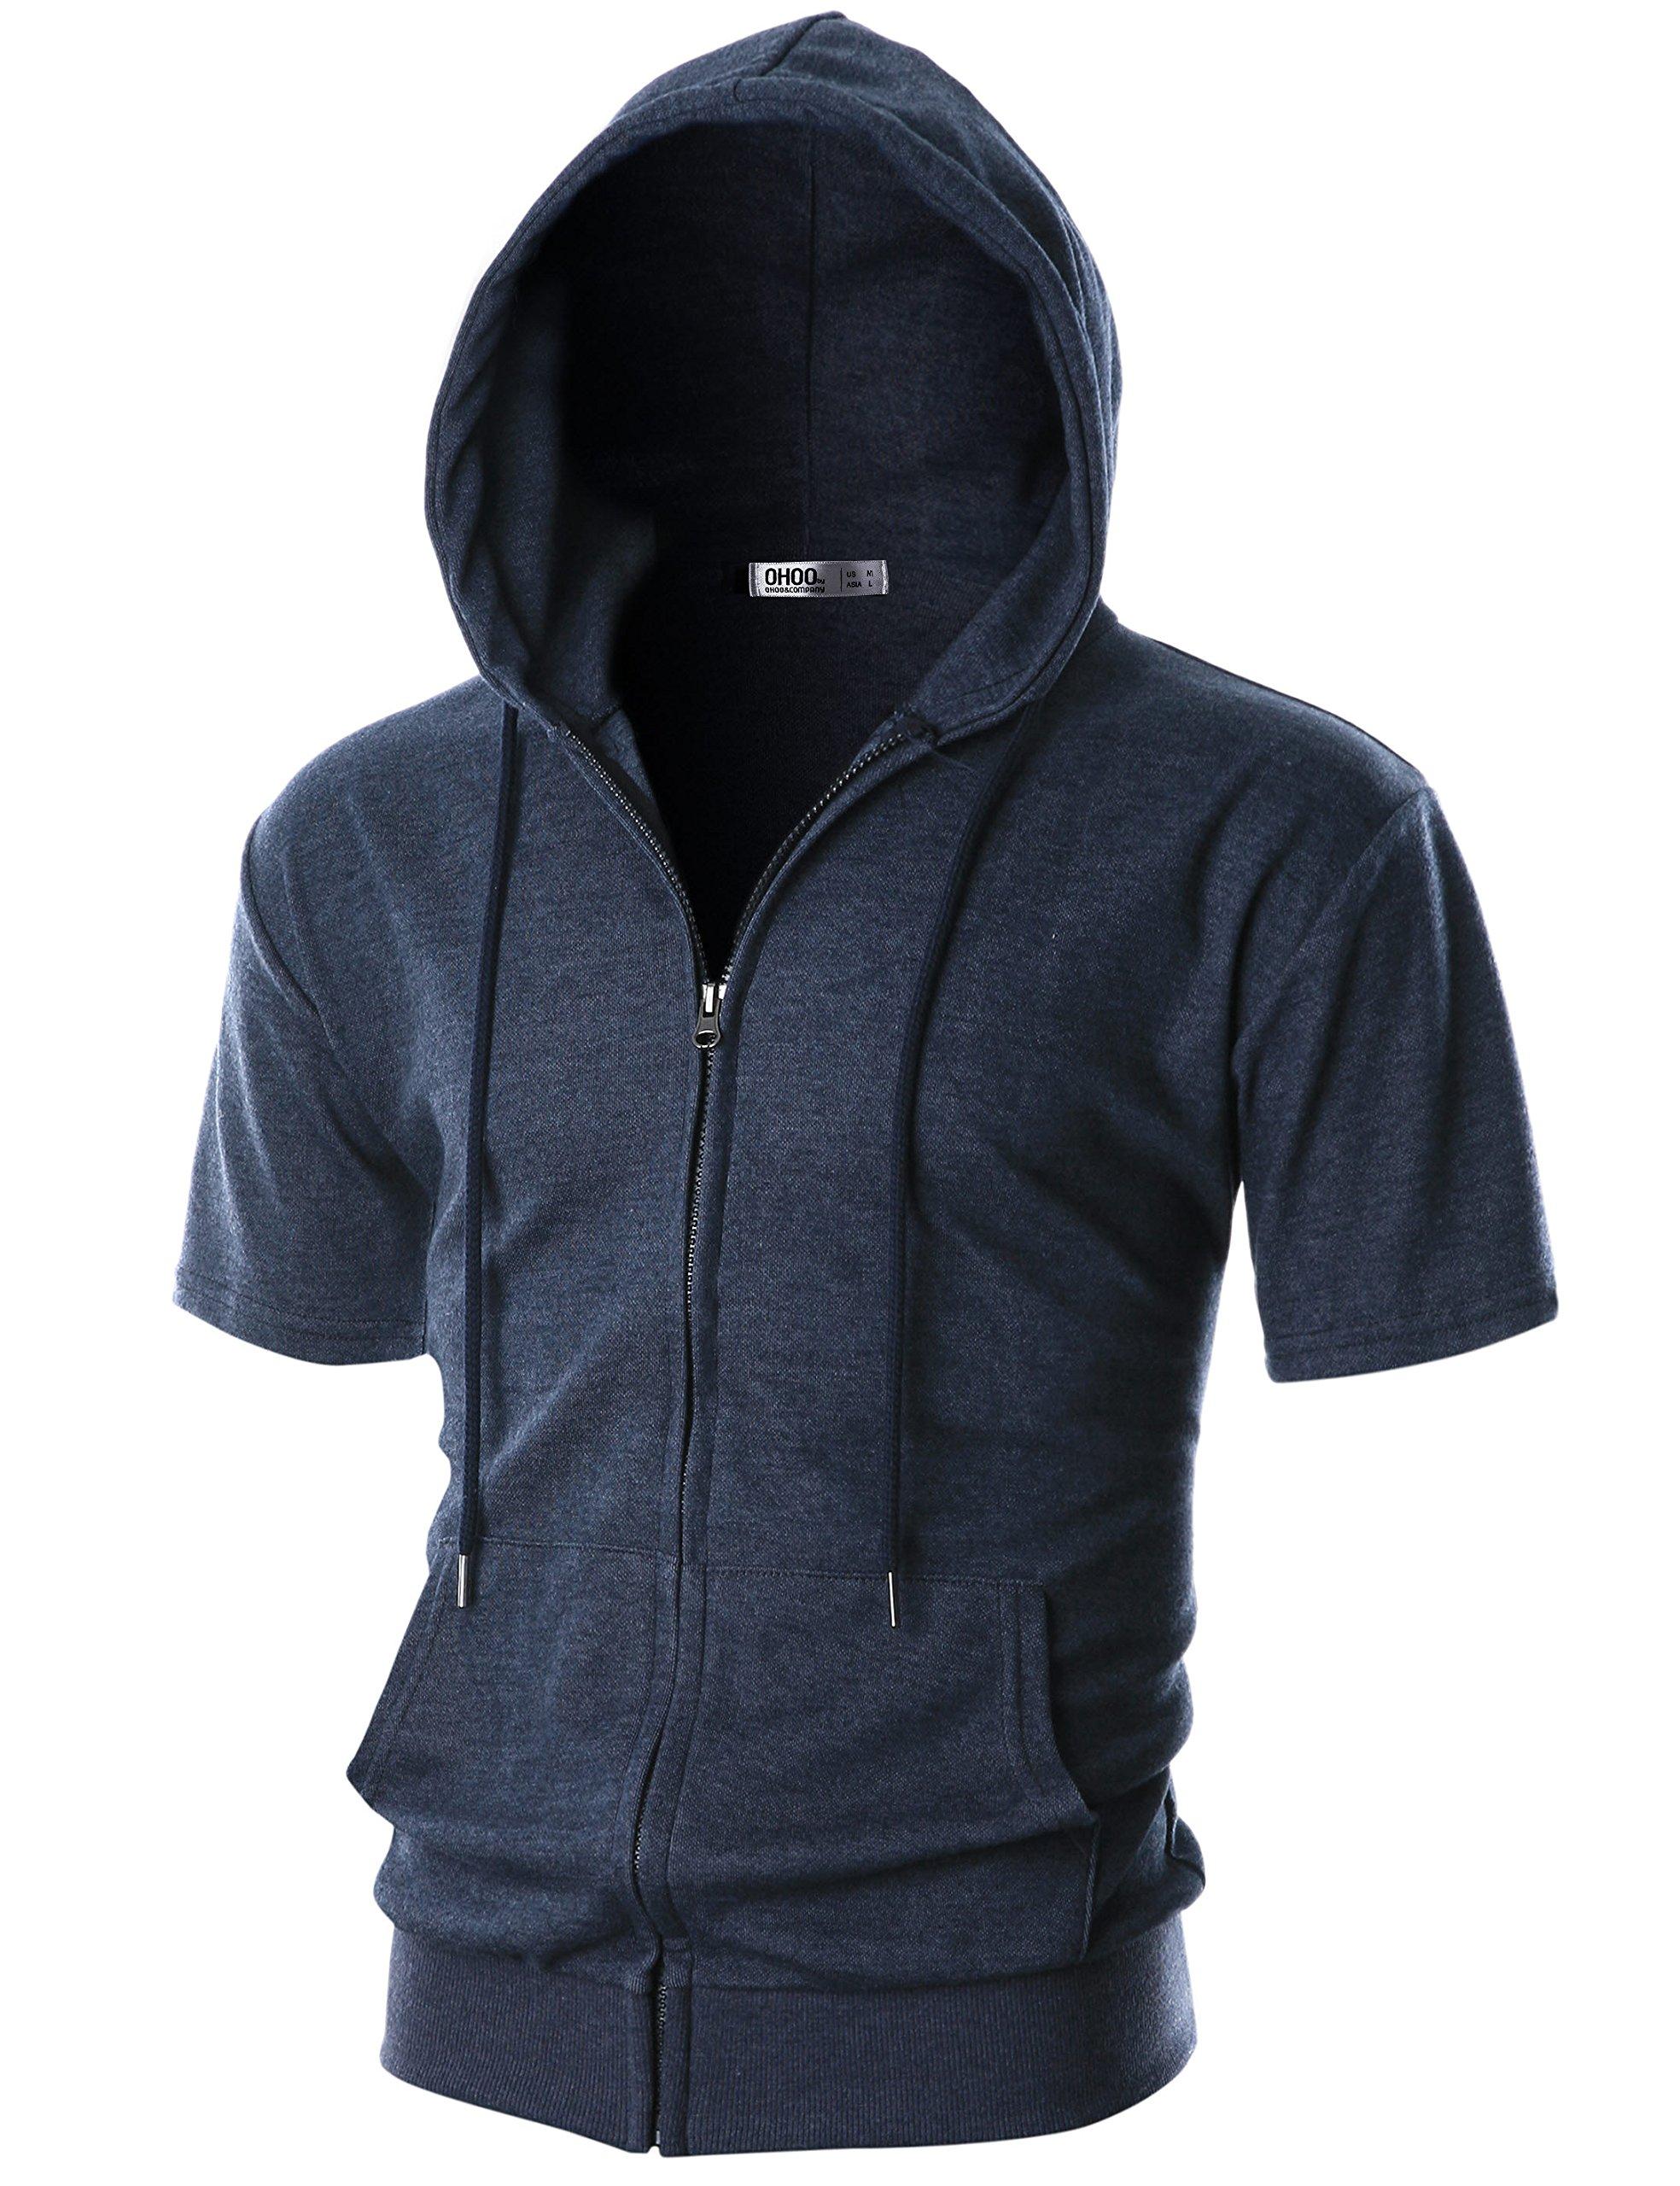 Ohoo Mens Slim Fit Short Sleeve Lightweight One-Tone Zip-up Hoodie with Kanga Pocket/DCF056-NAVYMELANGE-L